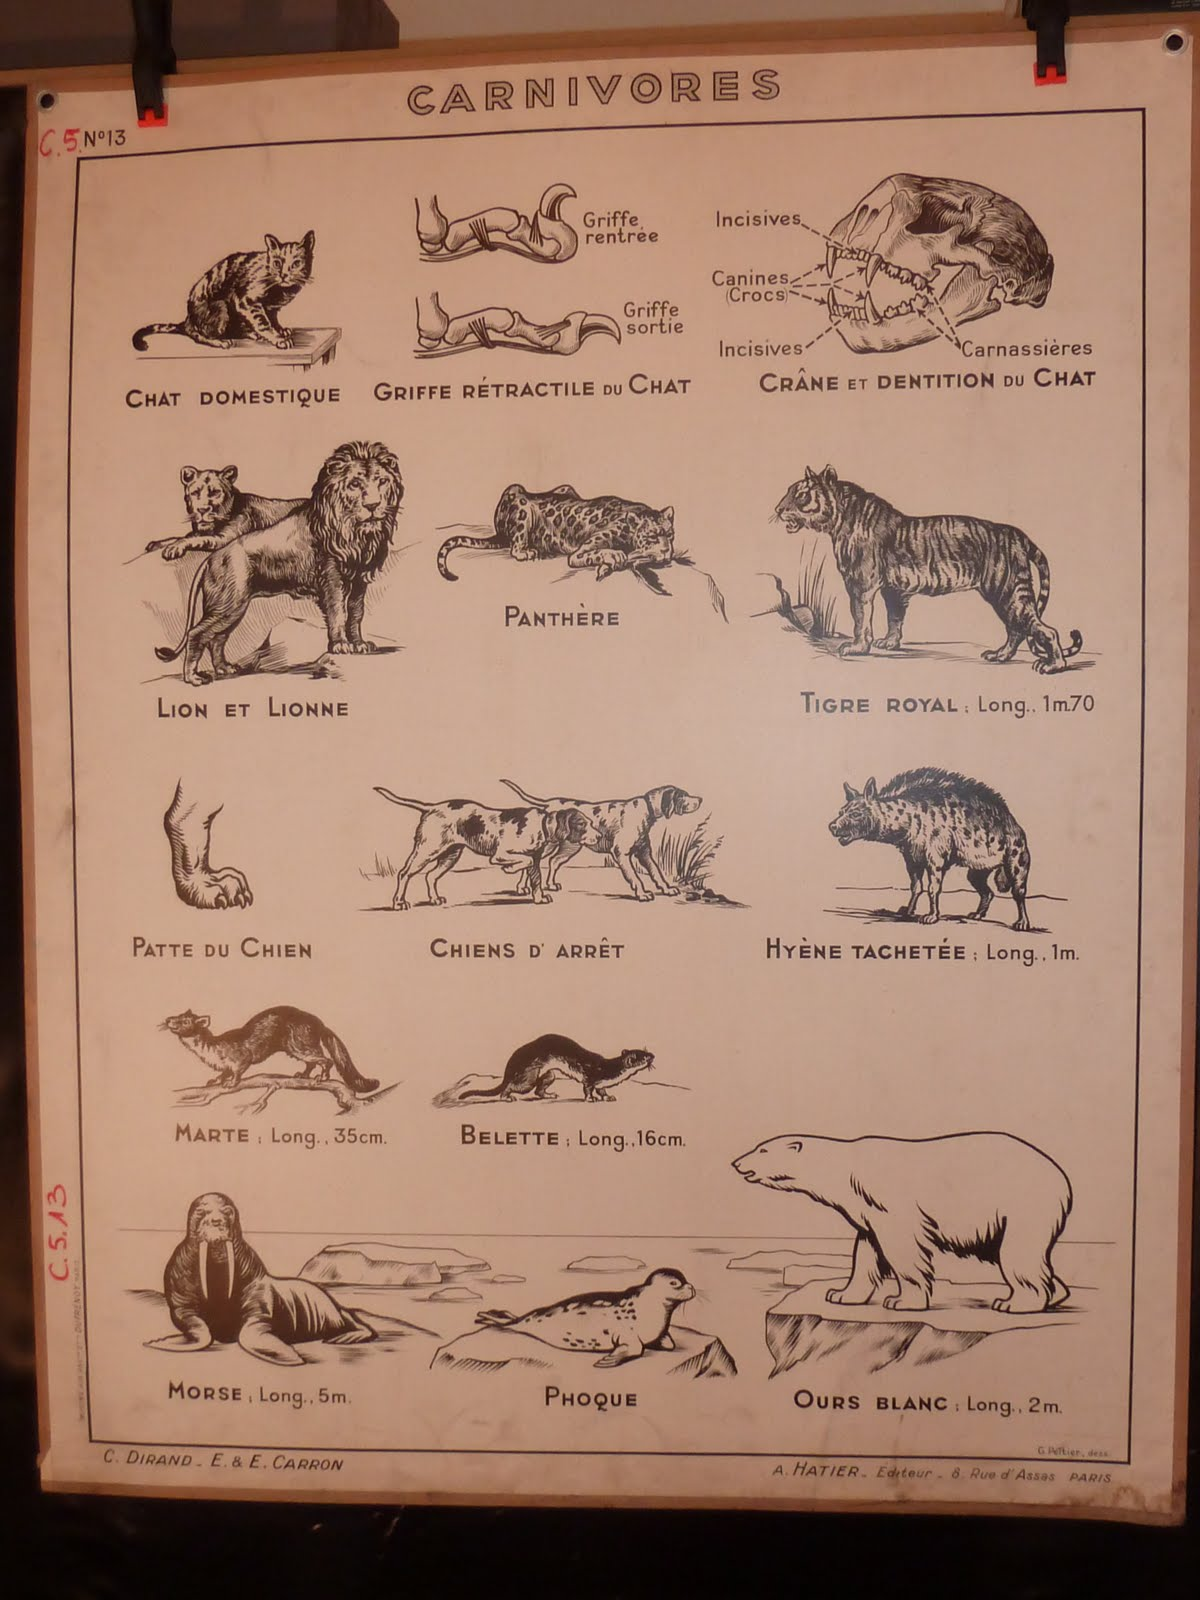 Vintage French Posters Botany Animals Anatomy Old World